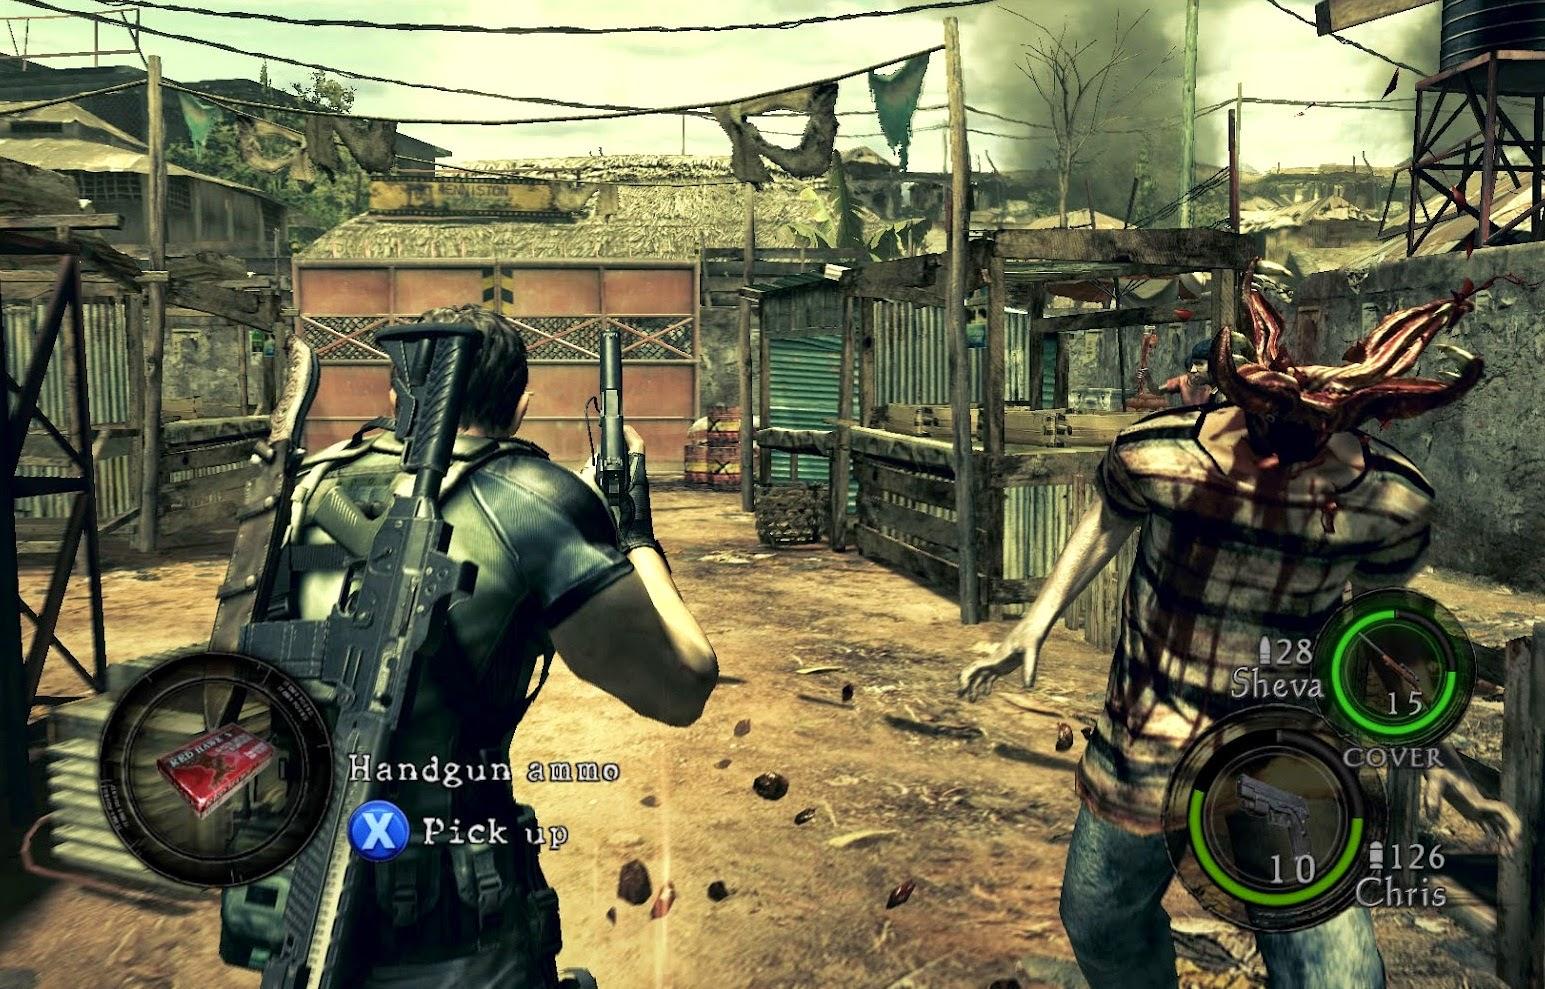 resident evil 5 game pc free download full version